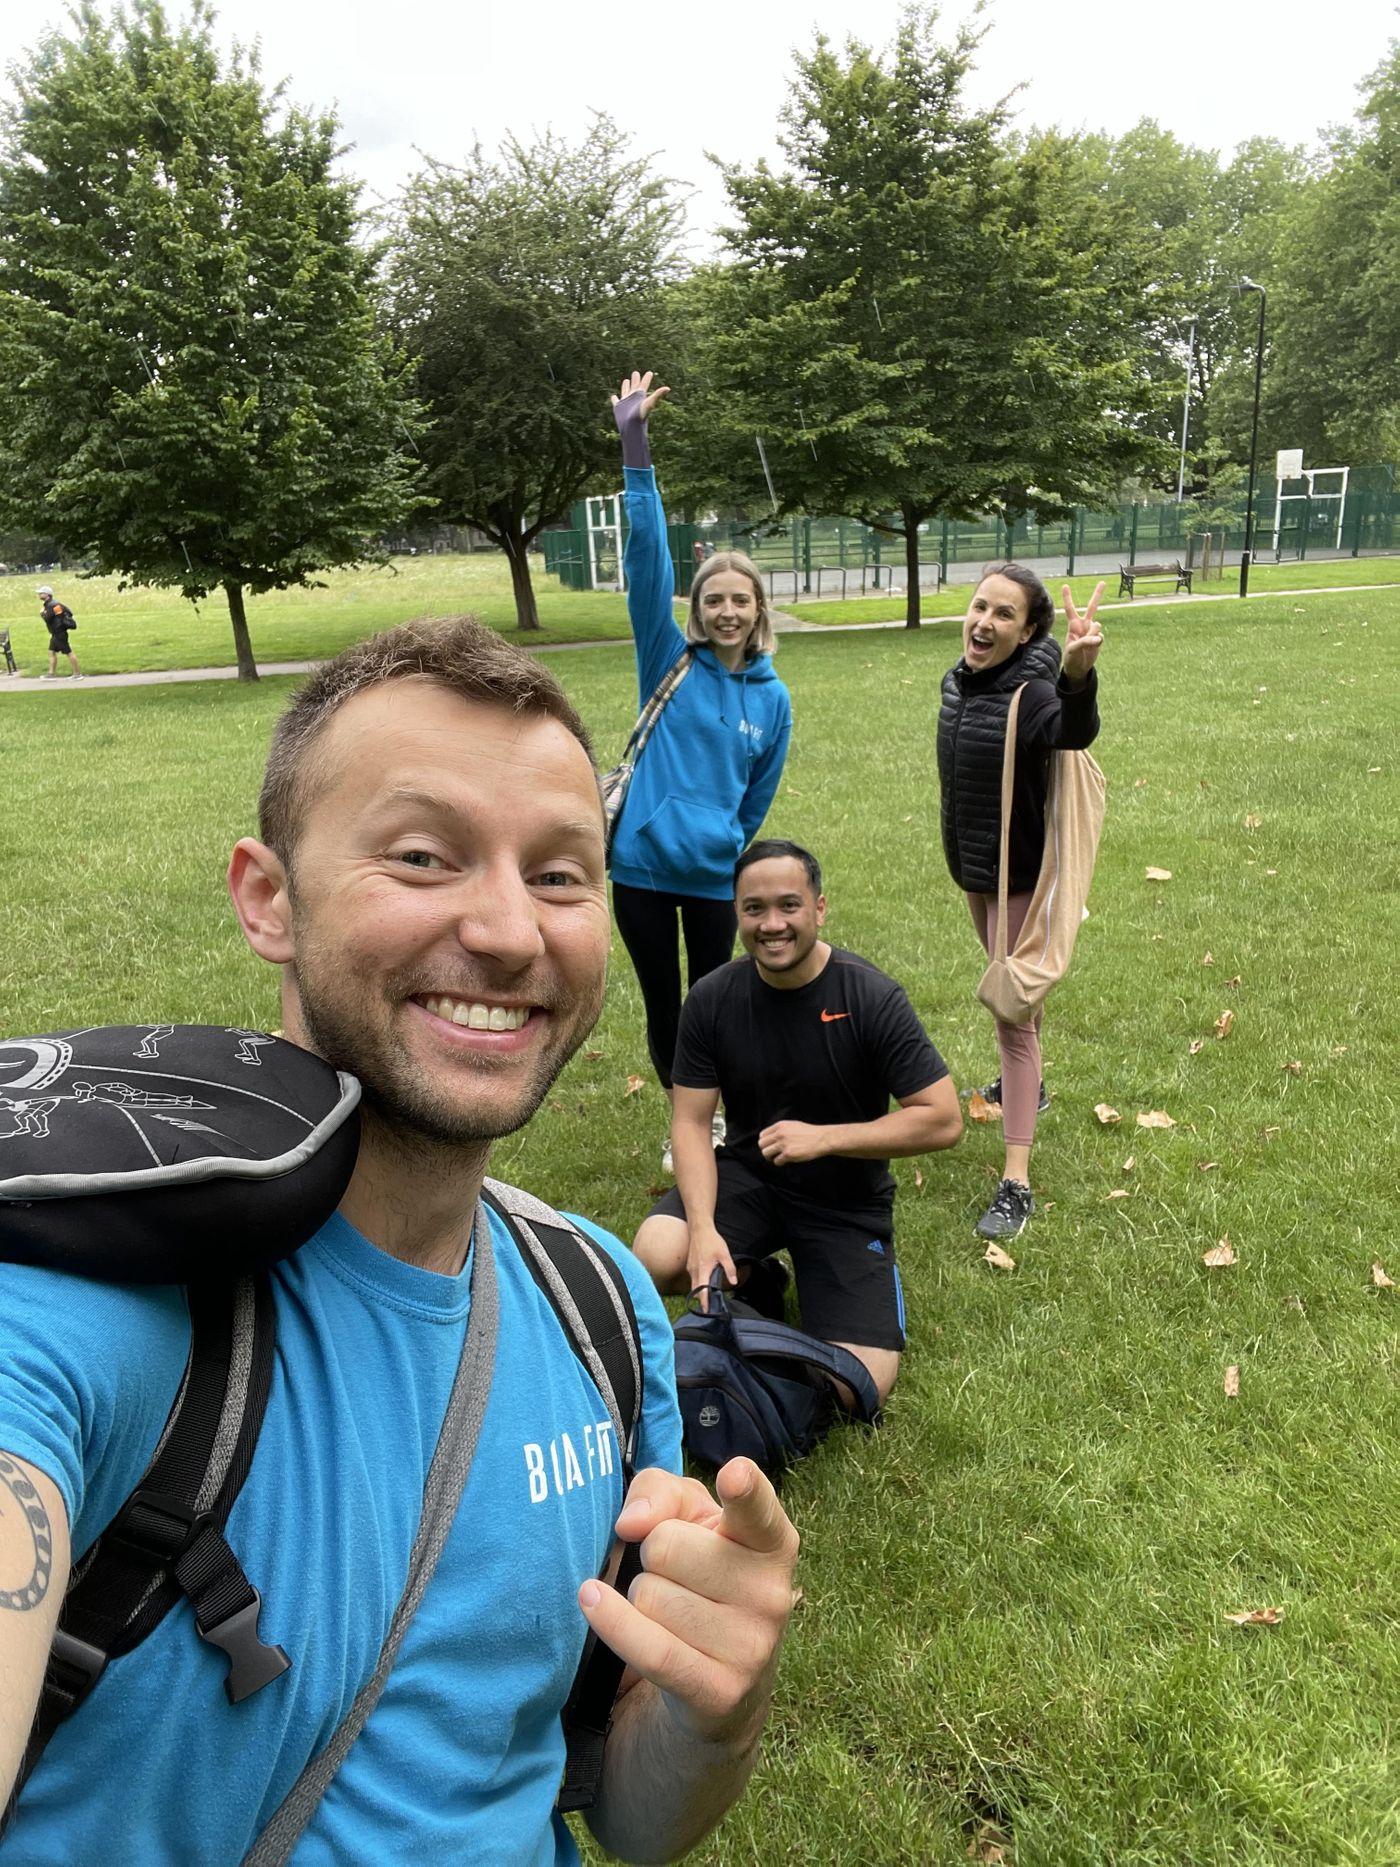 When Summer Bootcamp meets Yoga Mojo!  Go on Bua team!💪😎🏋️♂️🧘🏼♀️